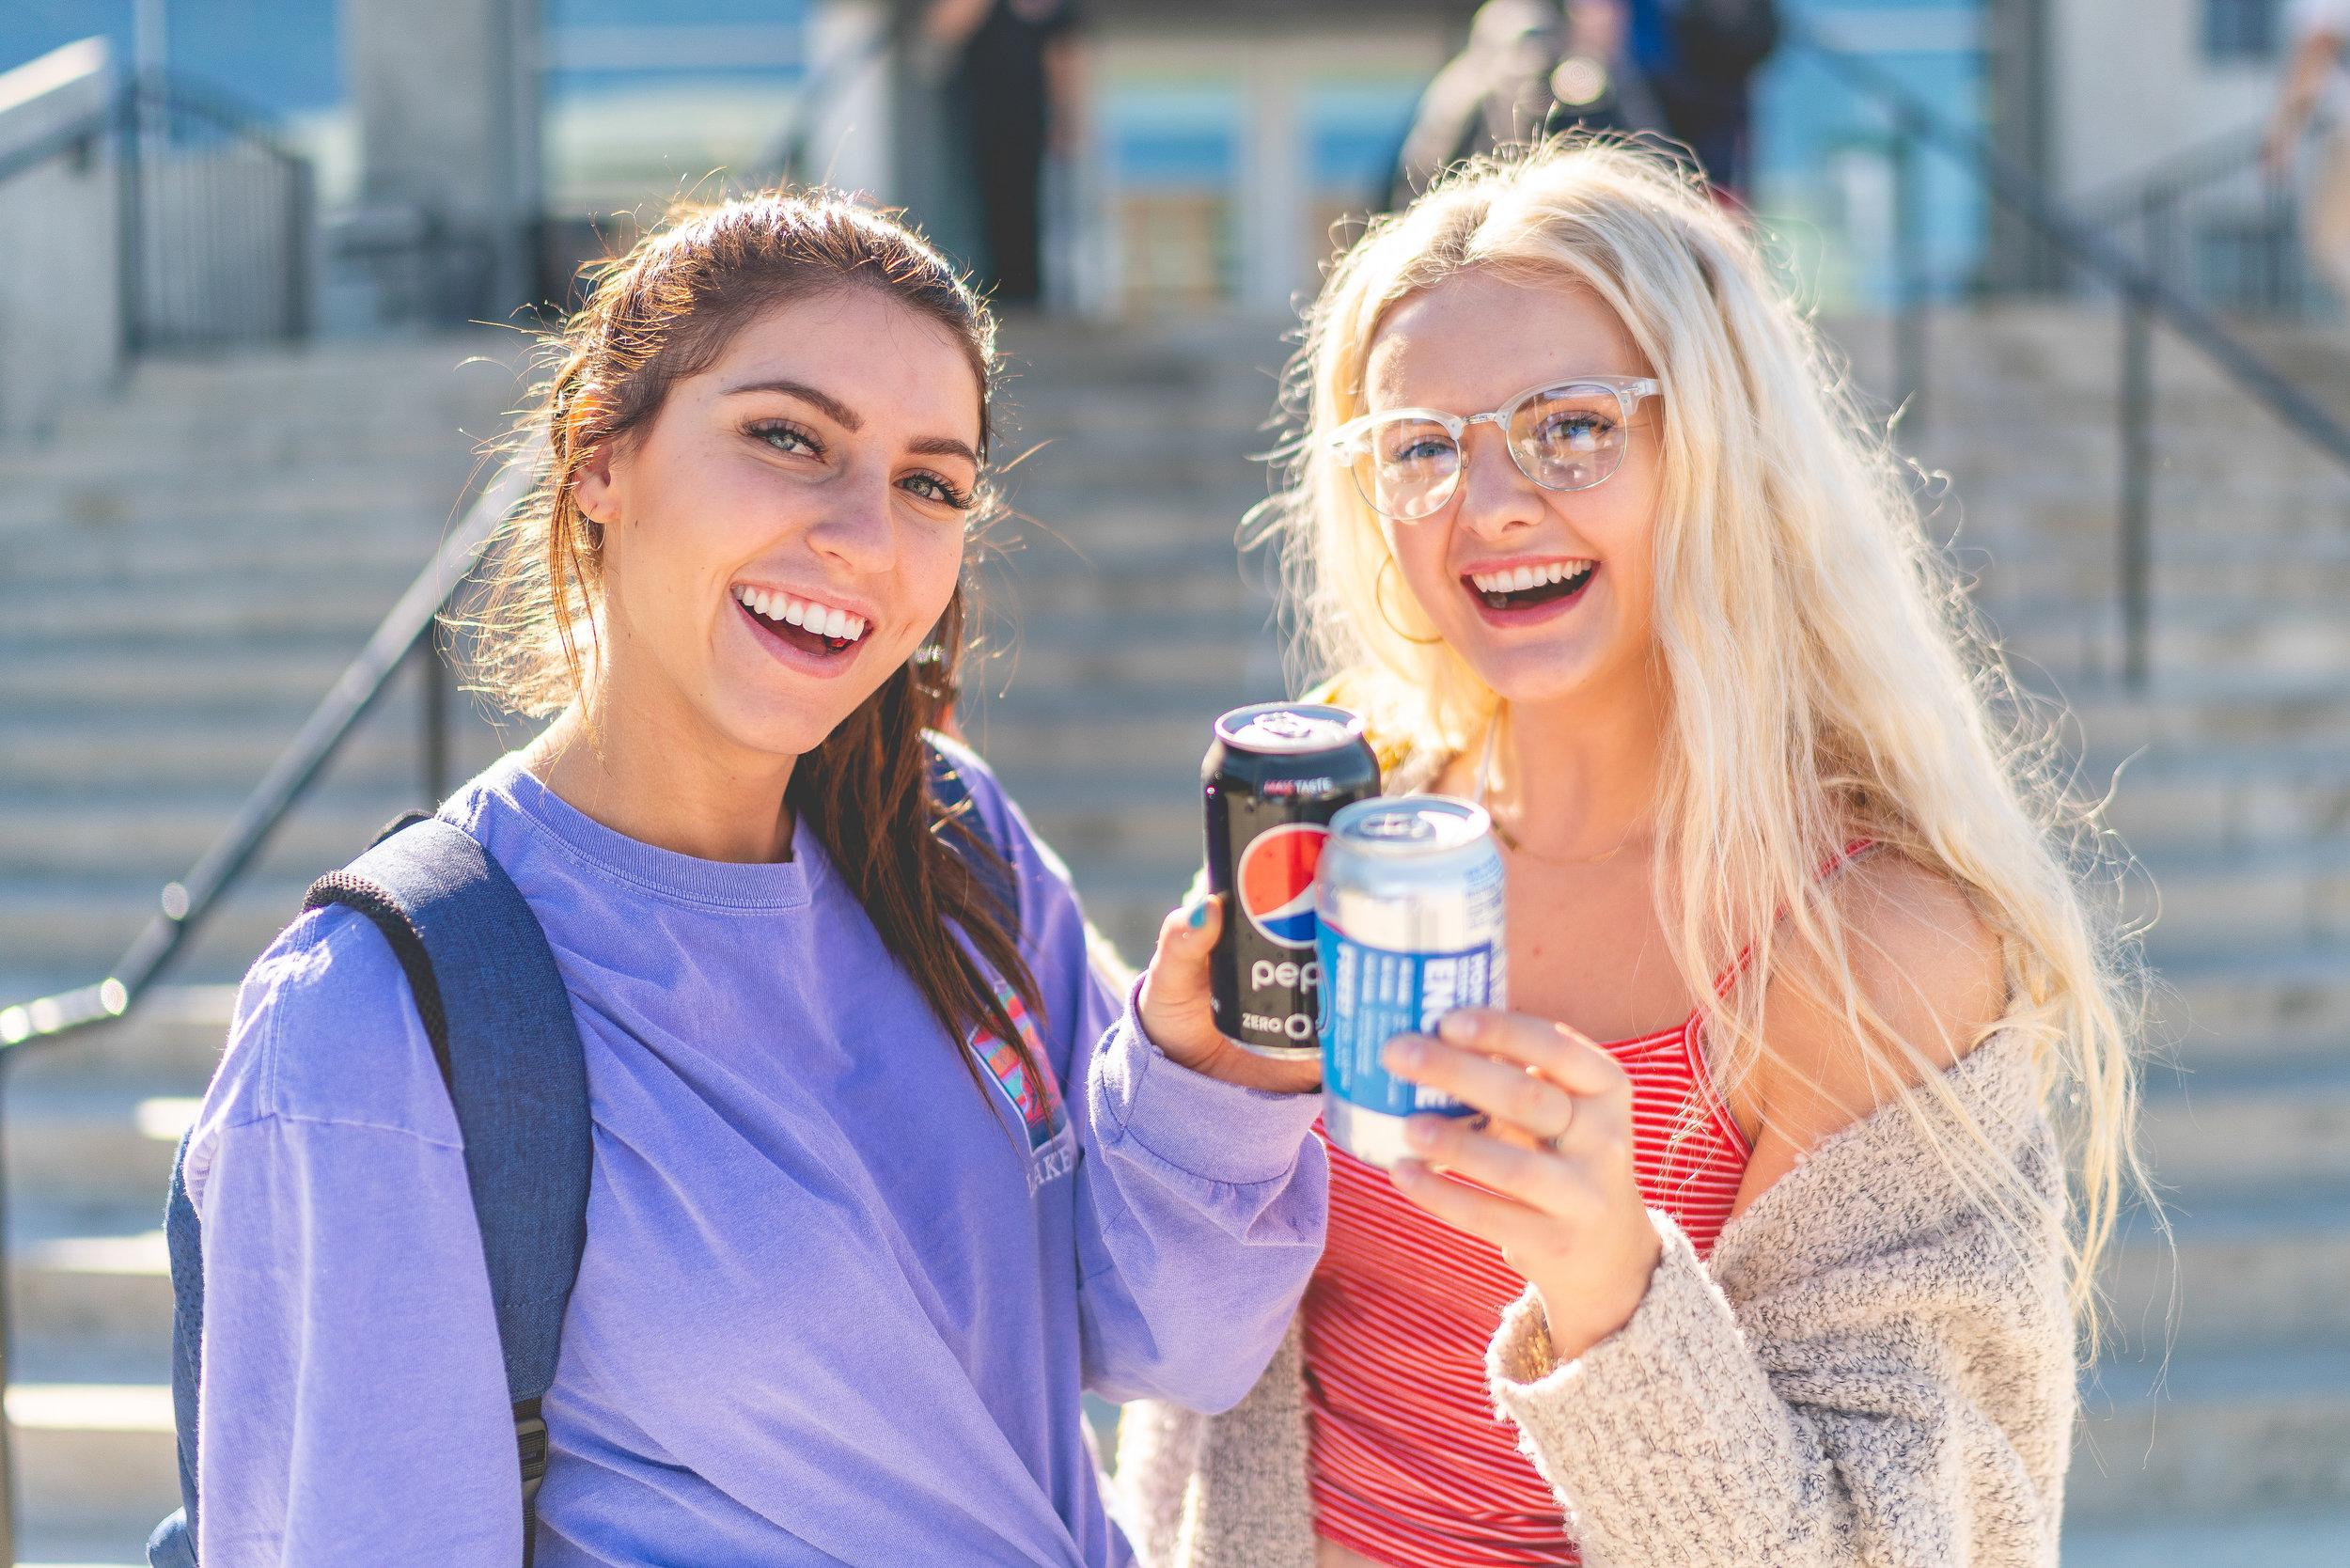 OHelloMedia-Pepsi-UVUHomecoming-9.28-102.jpg